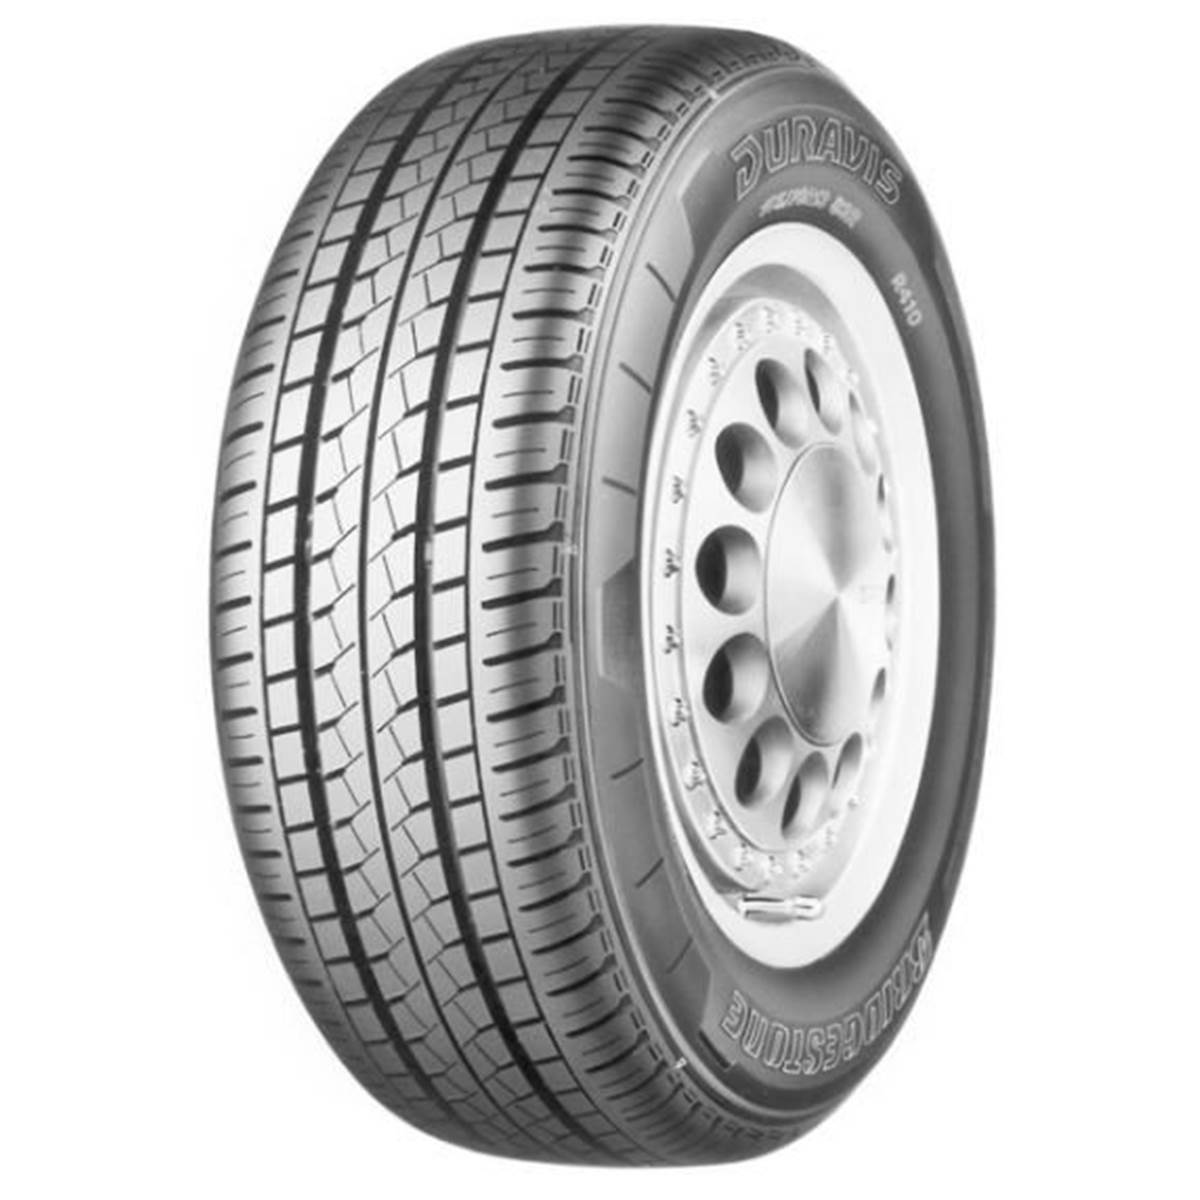 Pneu Bridgestone 165/70R13 83R Duravis R410